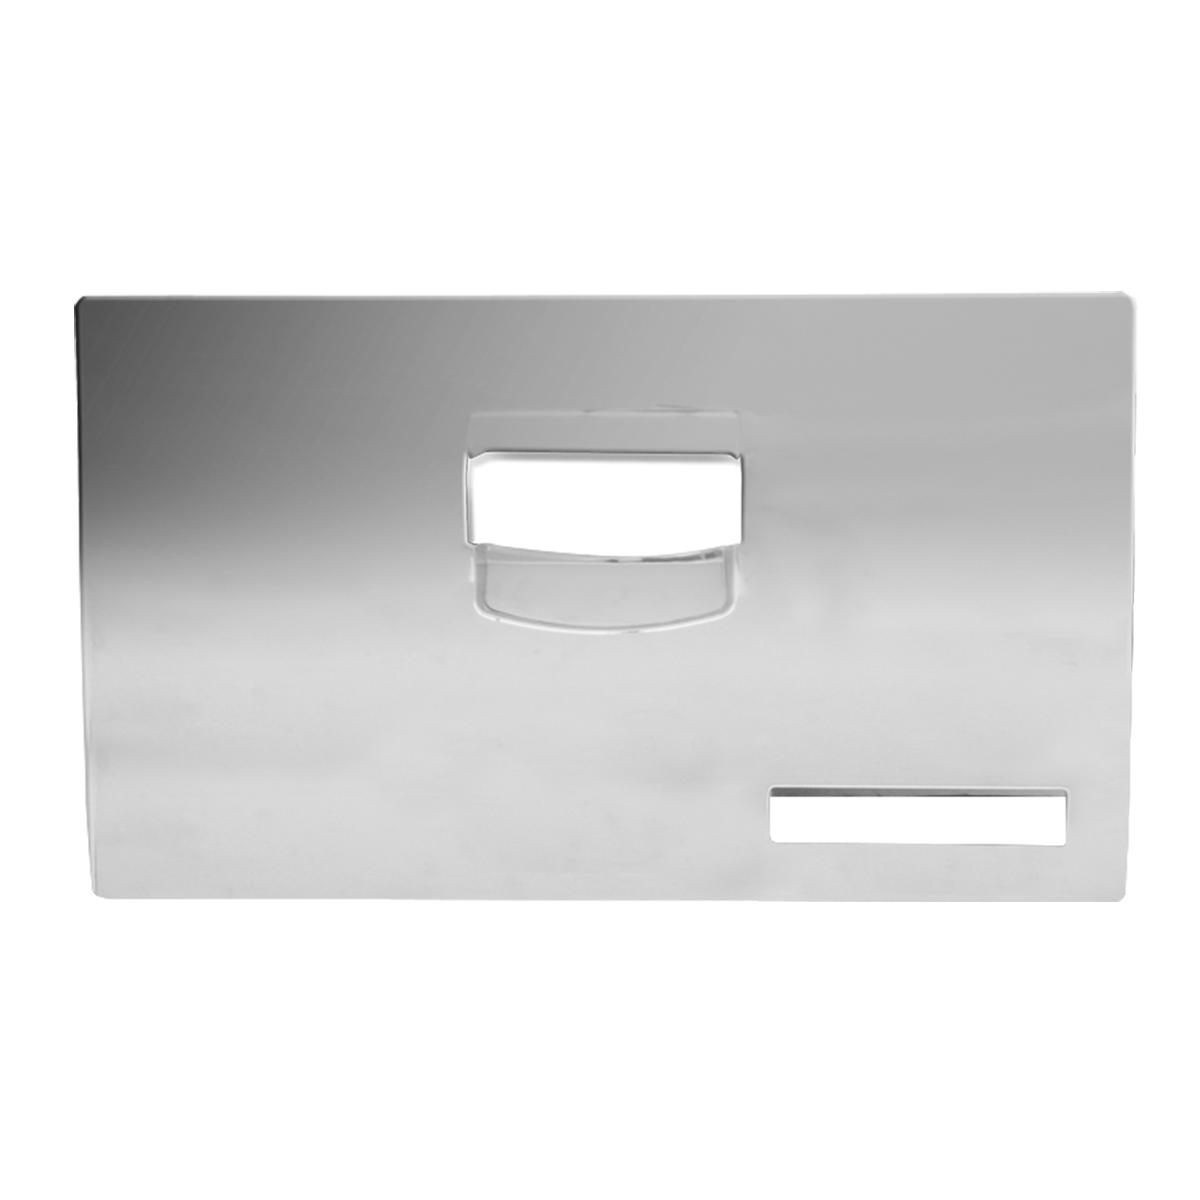 67843 Glove Box Door Cover for Kenworth W&T